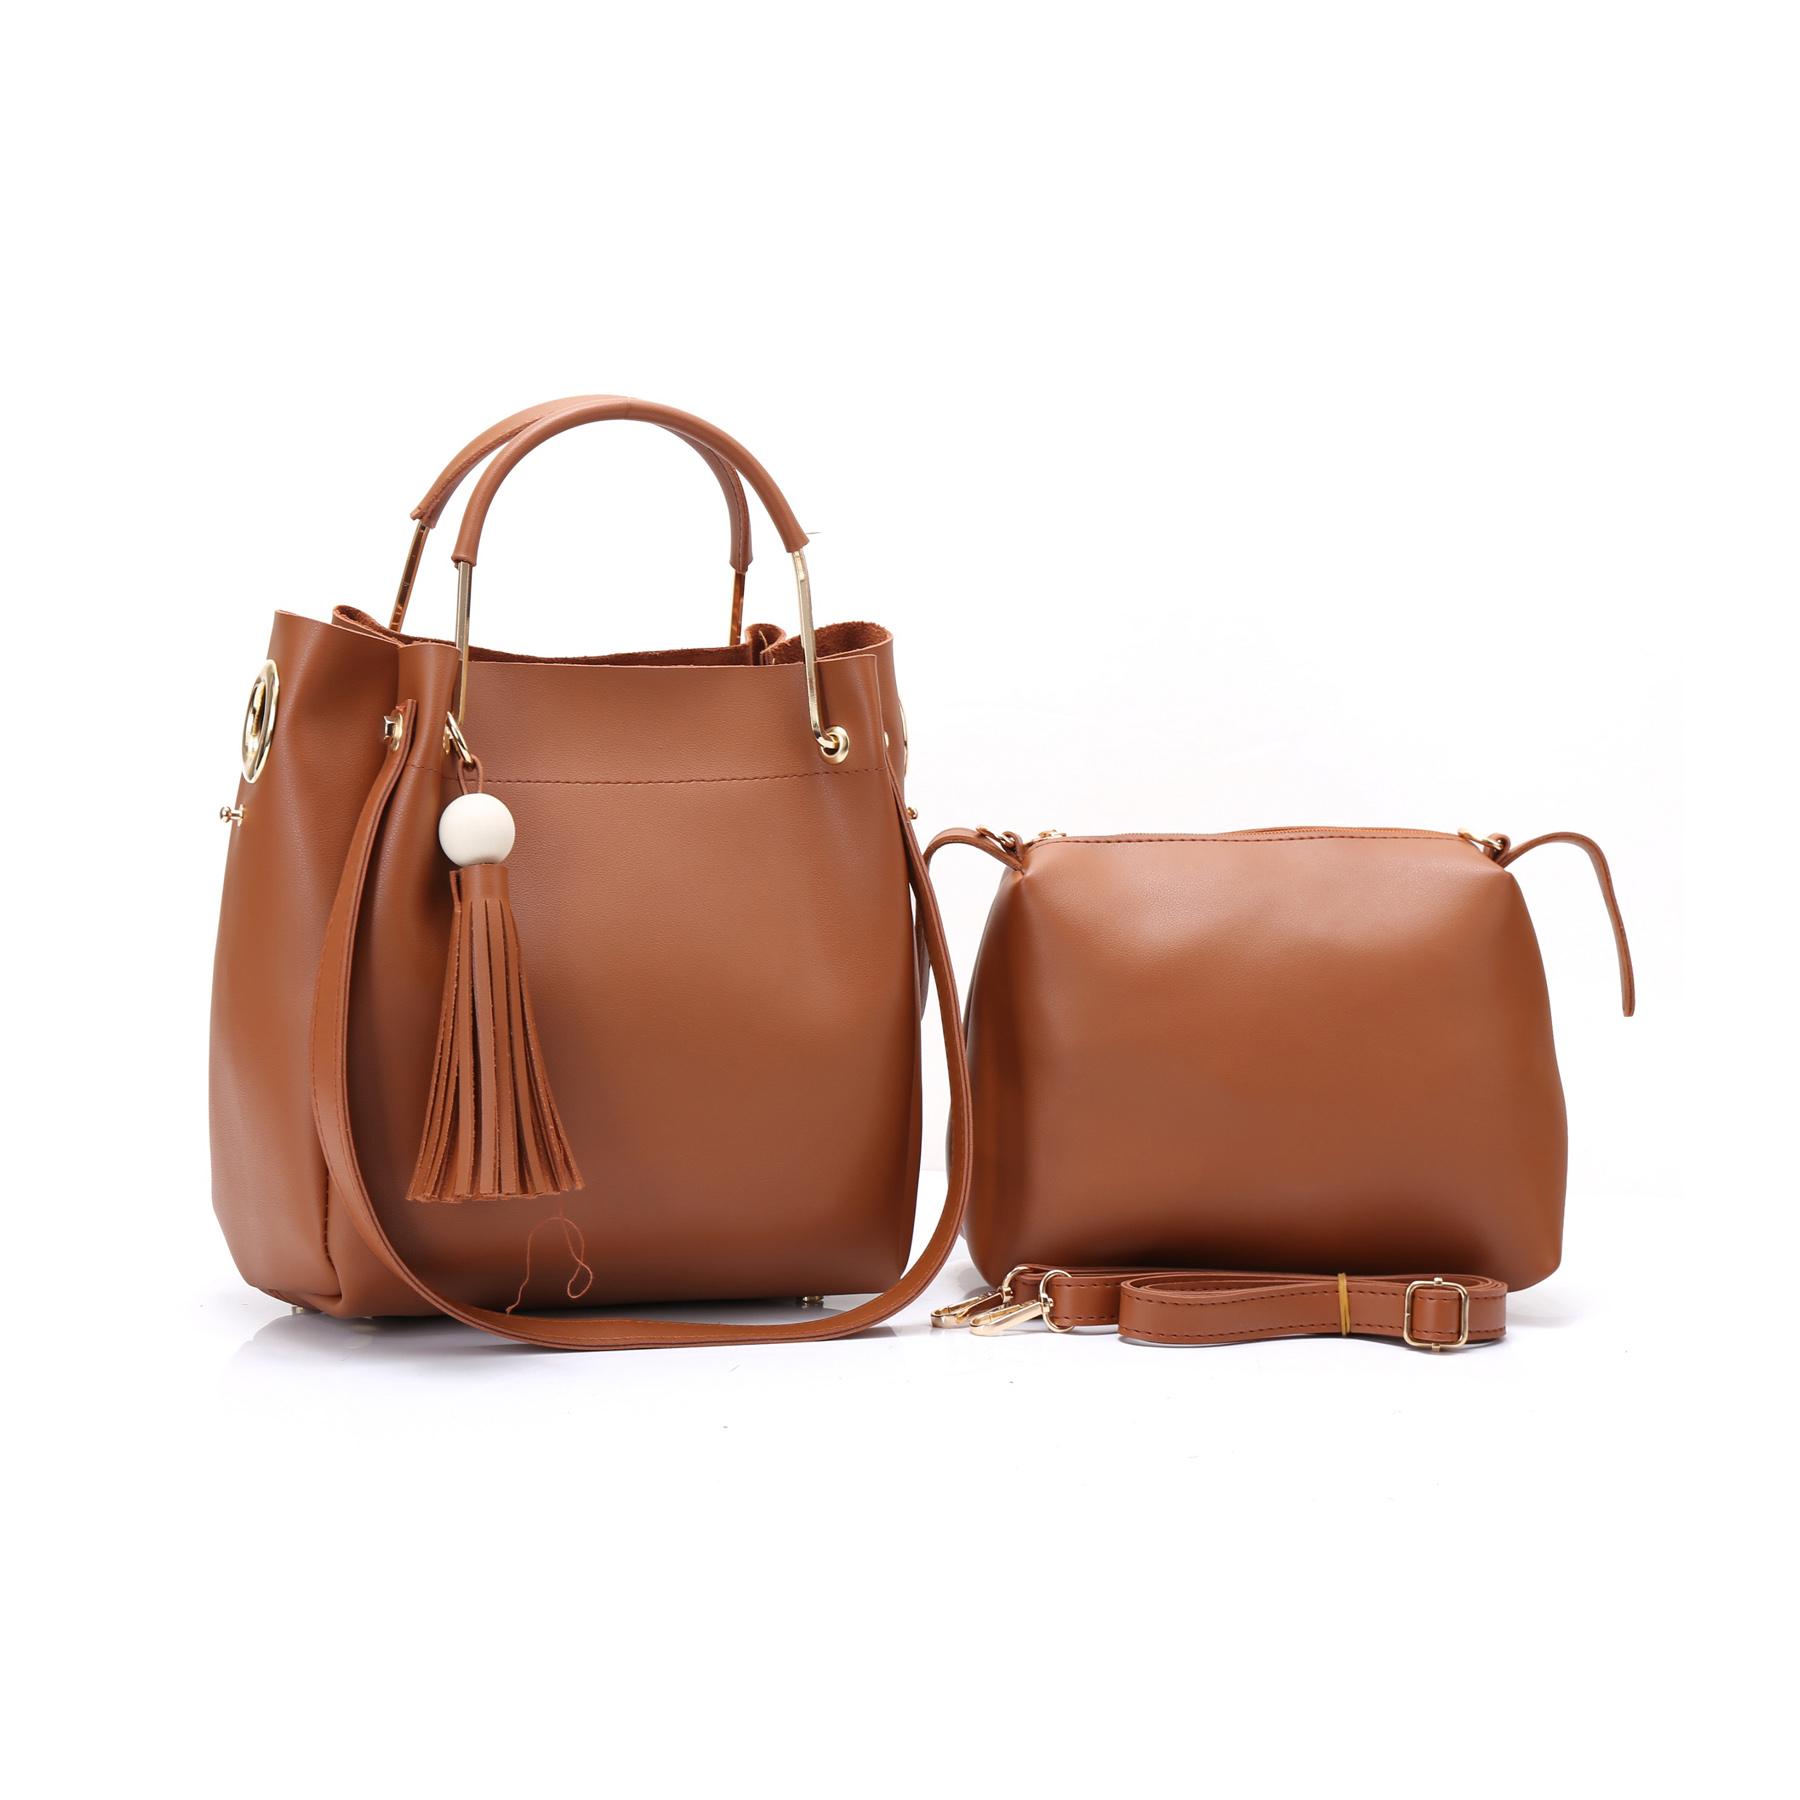 45ab1231a5 HB-064-silk-caress-designer-handbag-smooth-tassle-